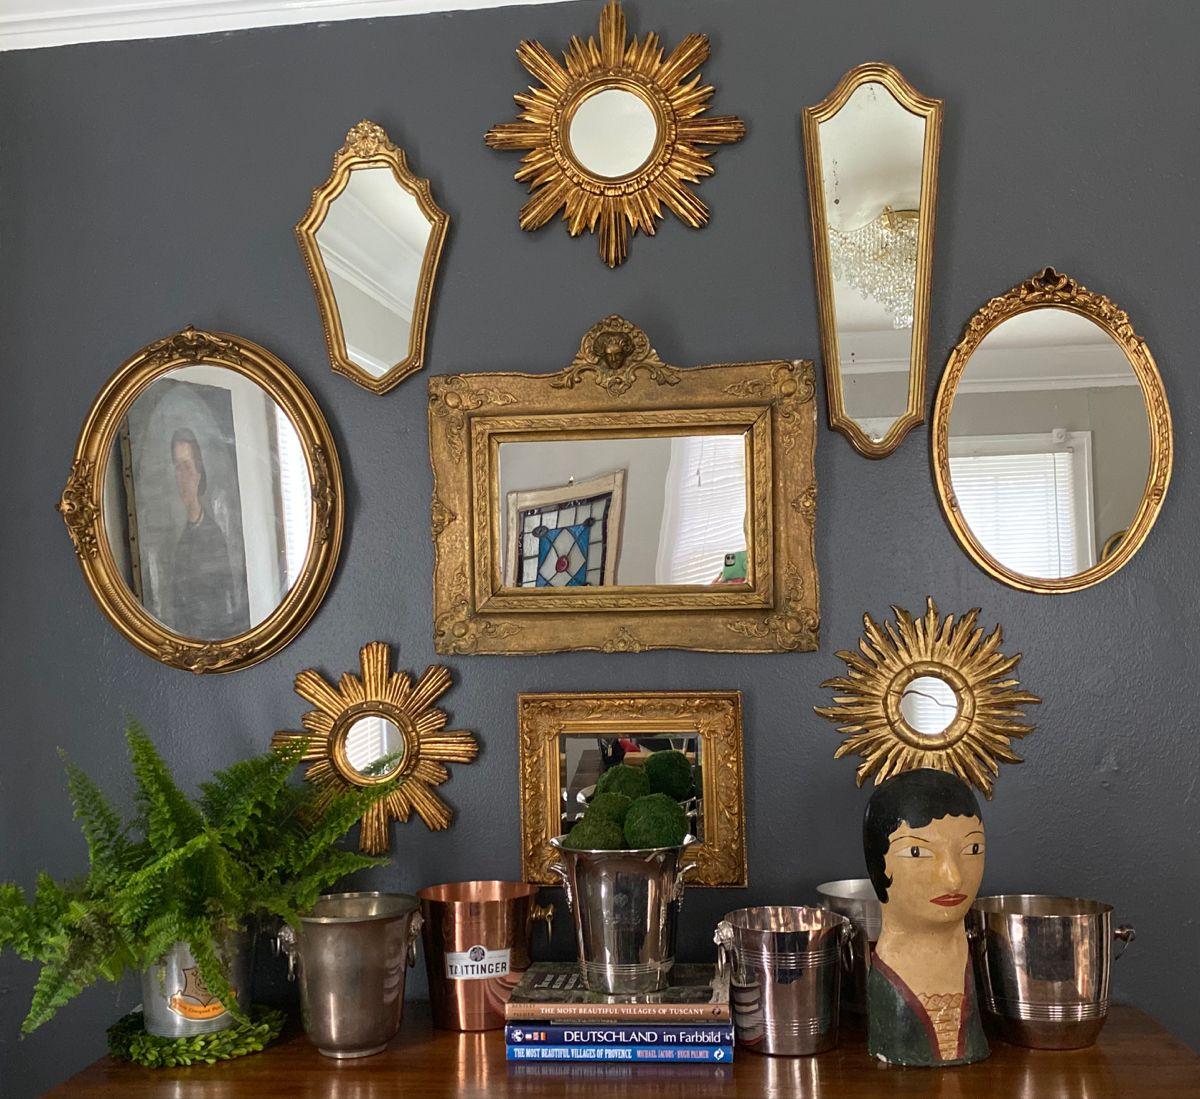 Mirror Gallery Wall Mirror Gallery Wall Sunburst Mirror Wall Mirror Gallery